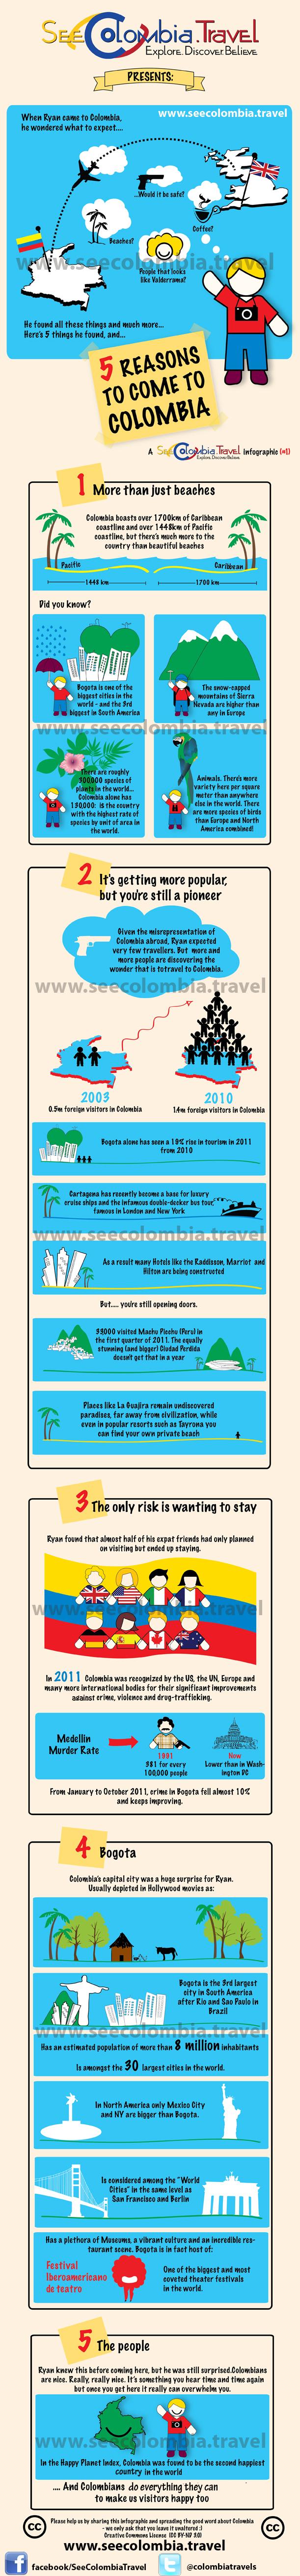 5 reasons to come to Colombia now / 5 razones para venir a Colombia ya. Please share / Por Favor Compartirlo :)